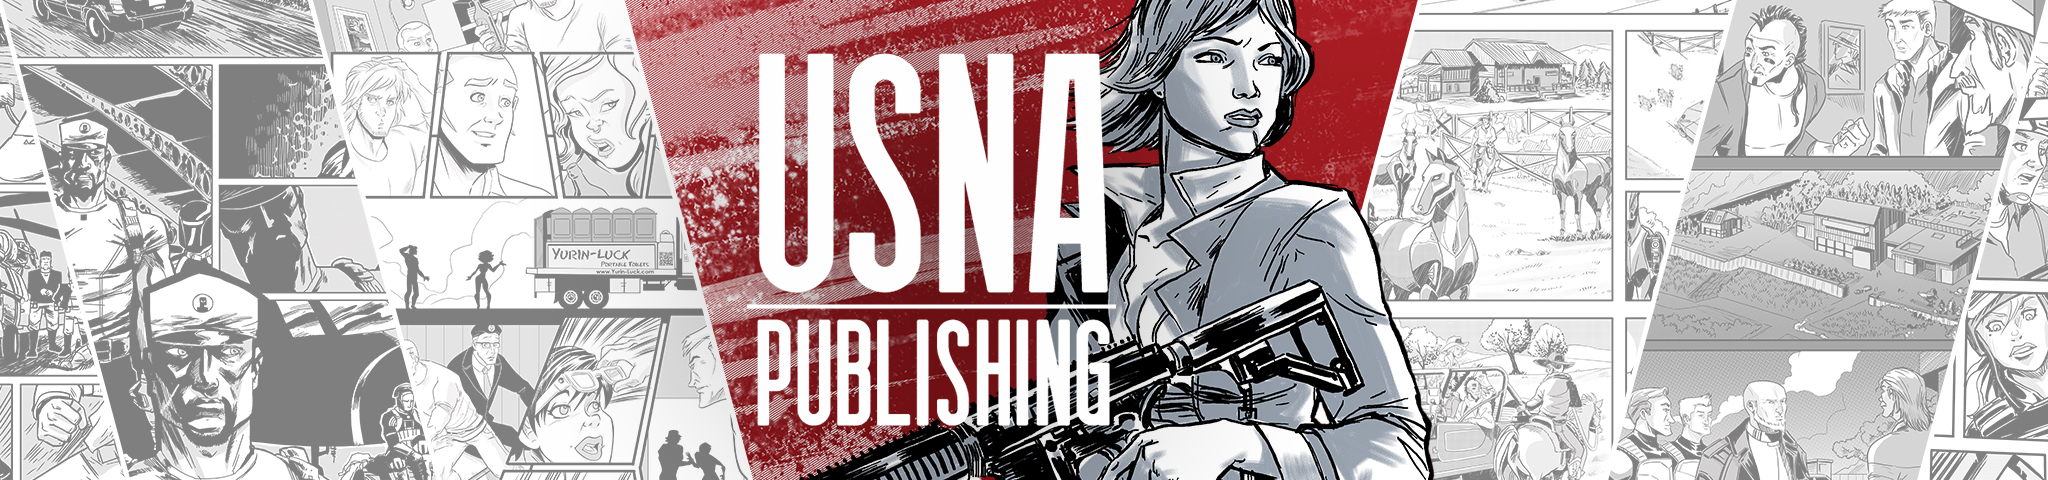 USNA_publisher_banner_InApp--2048x480.jpg